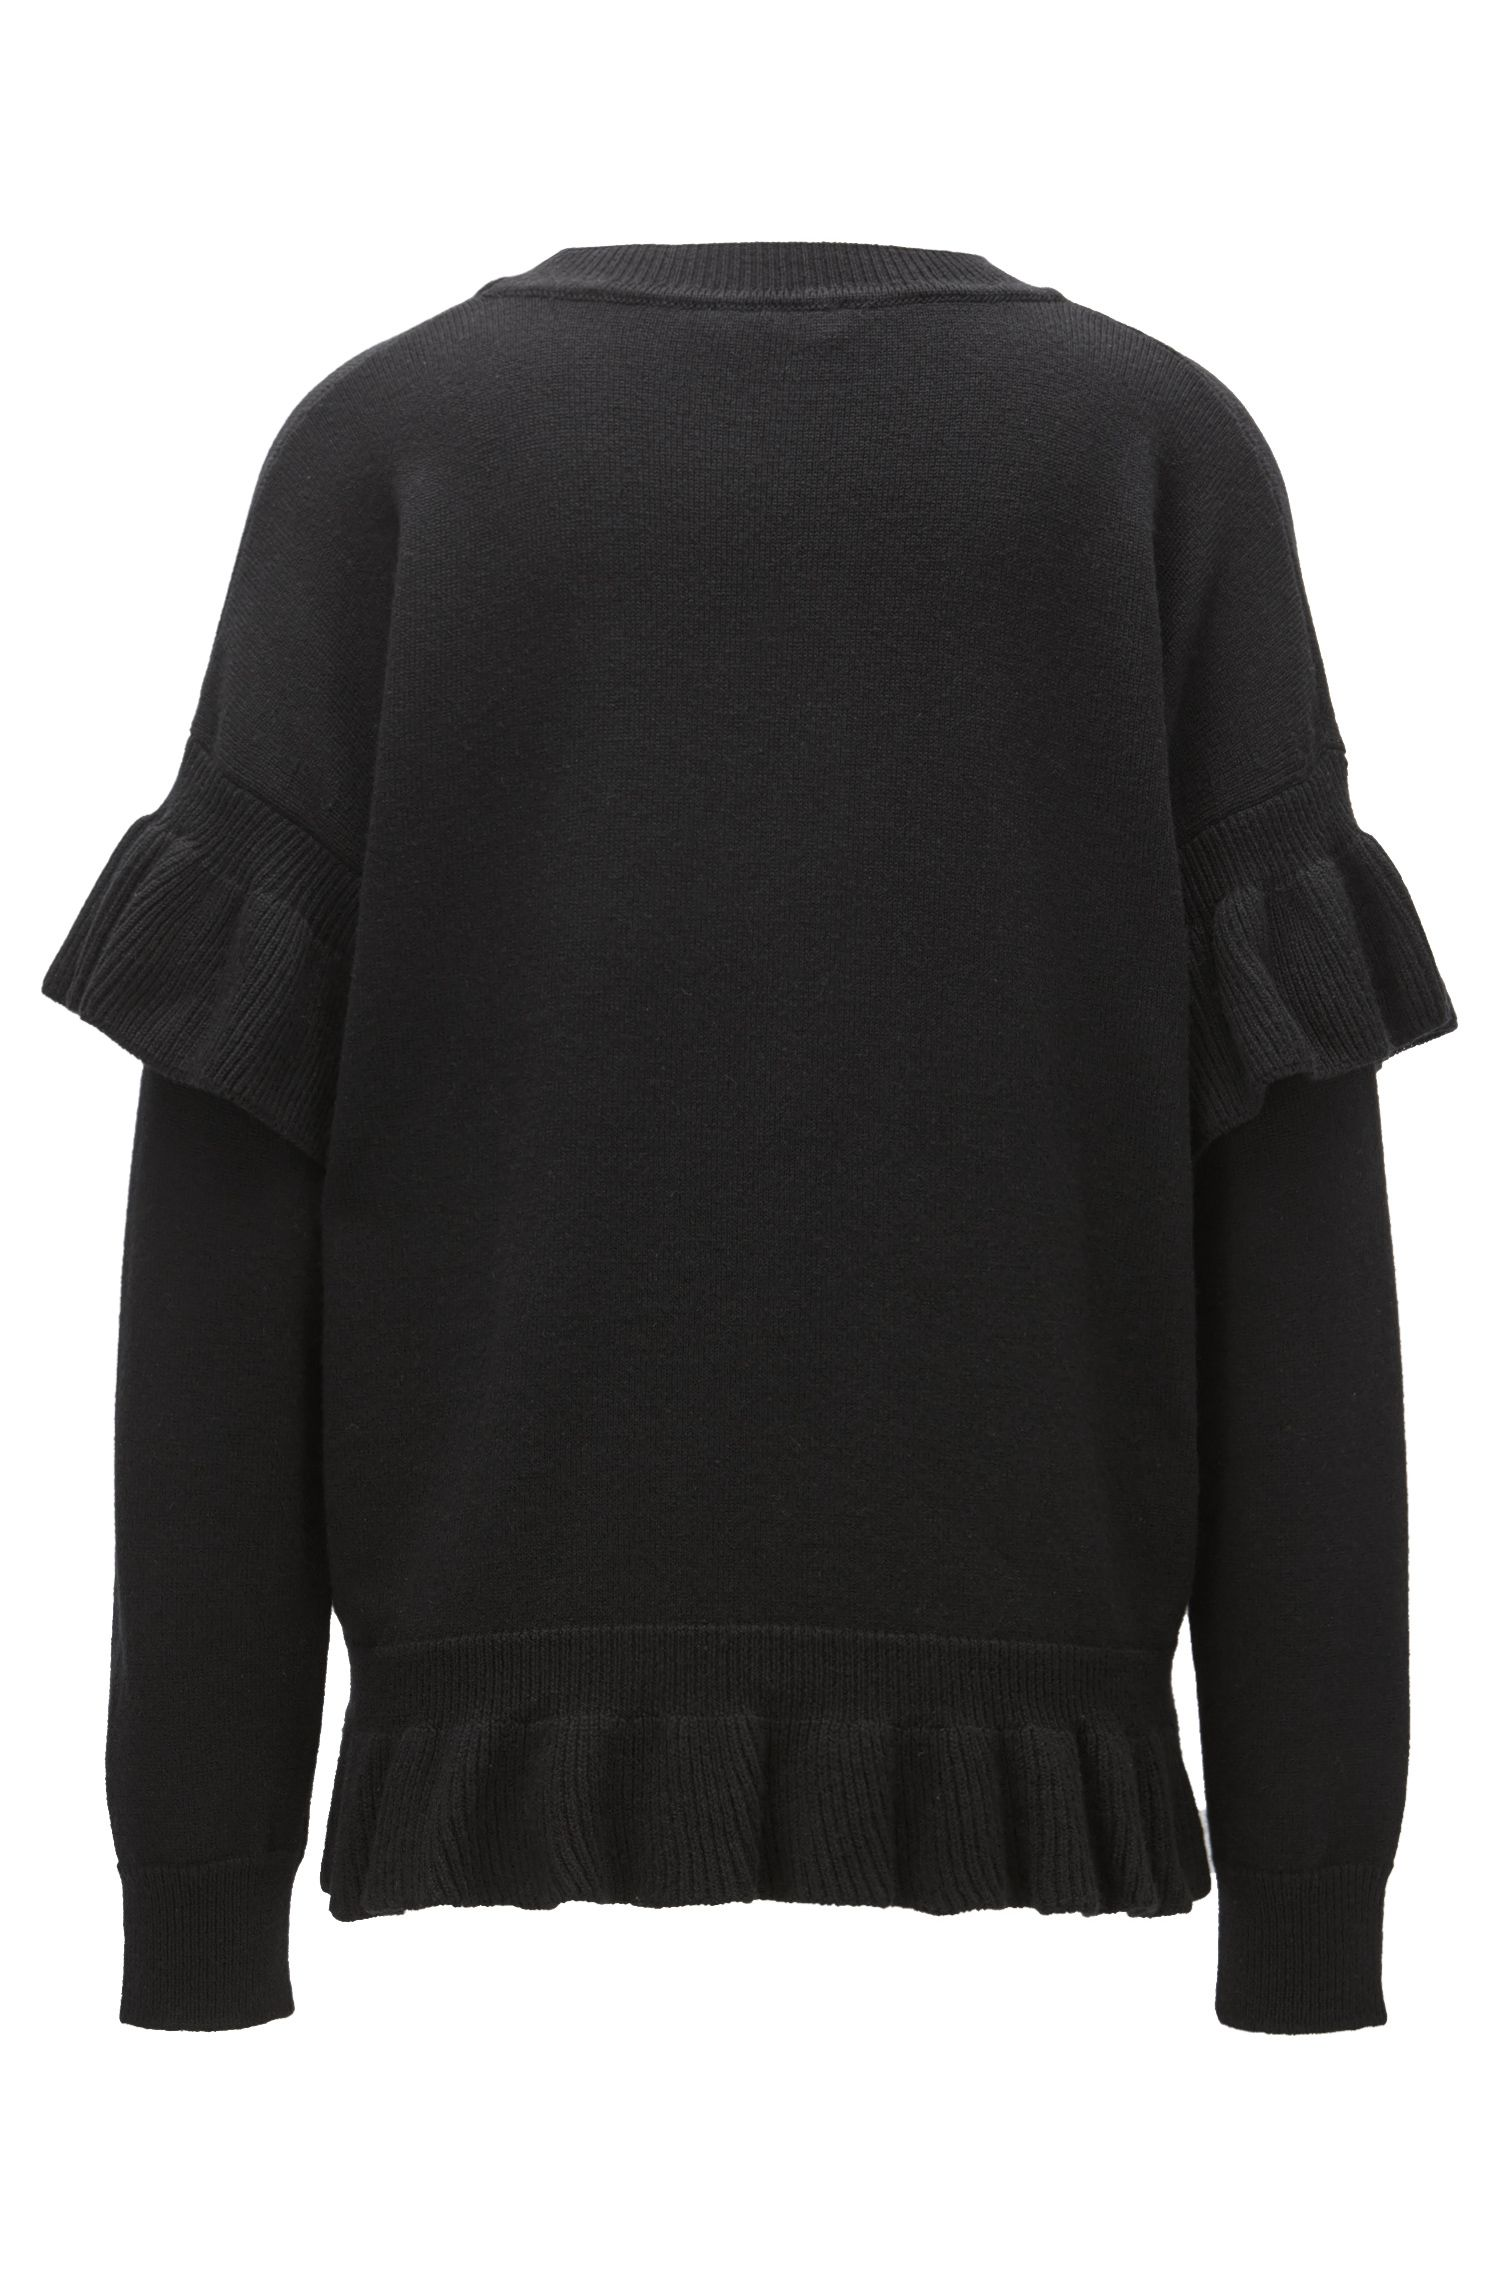 Jersey en mezcla de lana con detalles de volantes